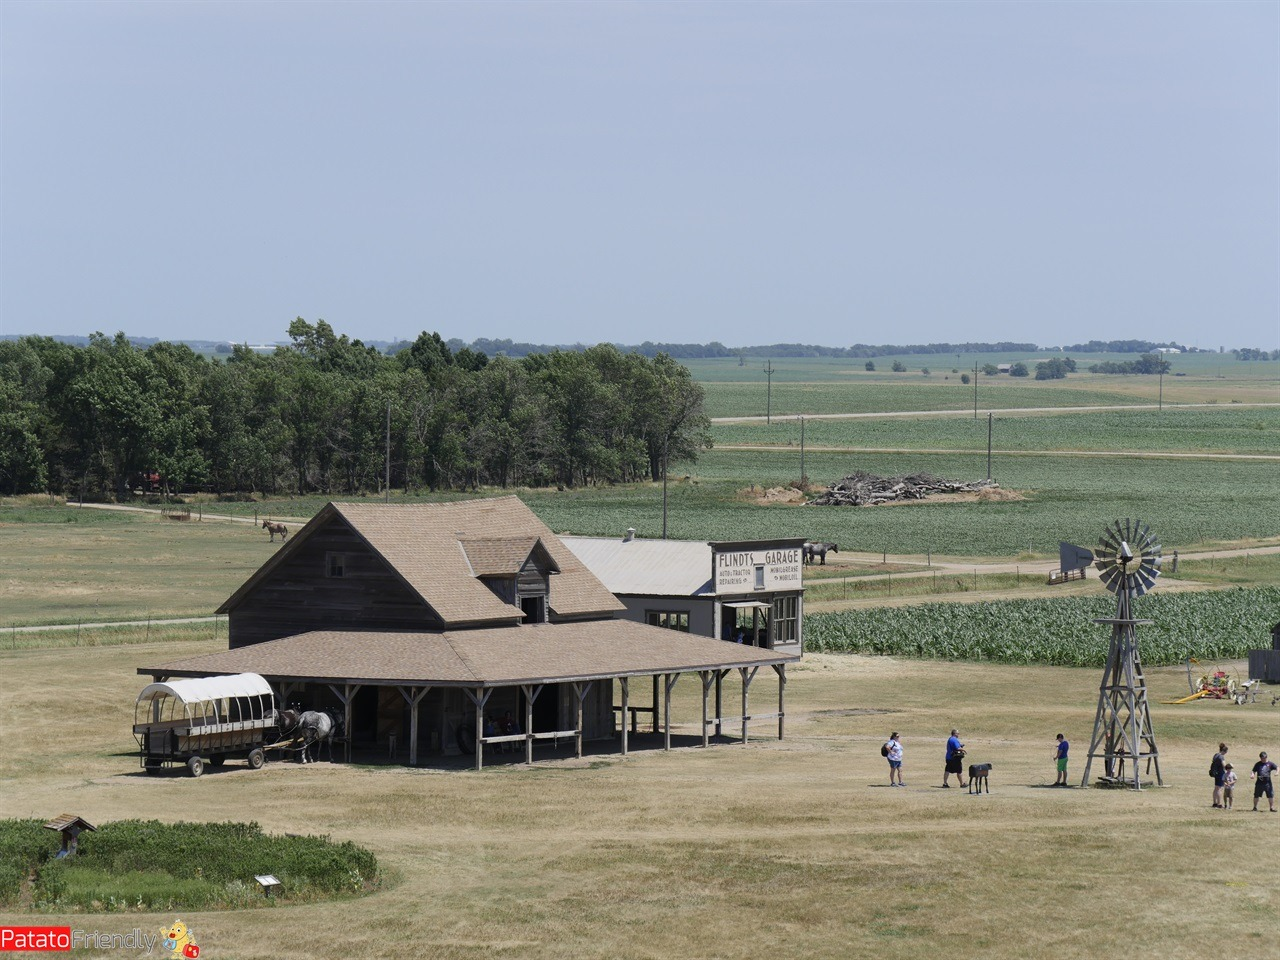 [cml_media_alt id='11540']Viaggio in South Dakota - La casa nella prateria di Laura Ingalls[/cml_media_alt]